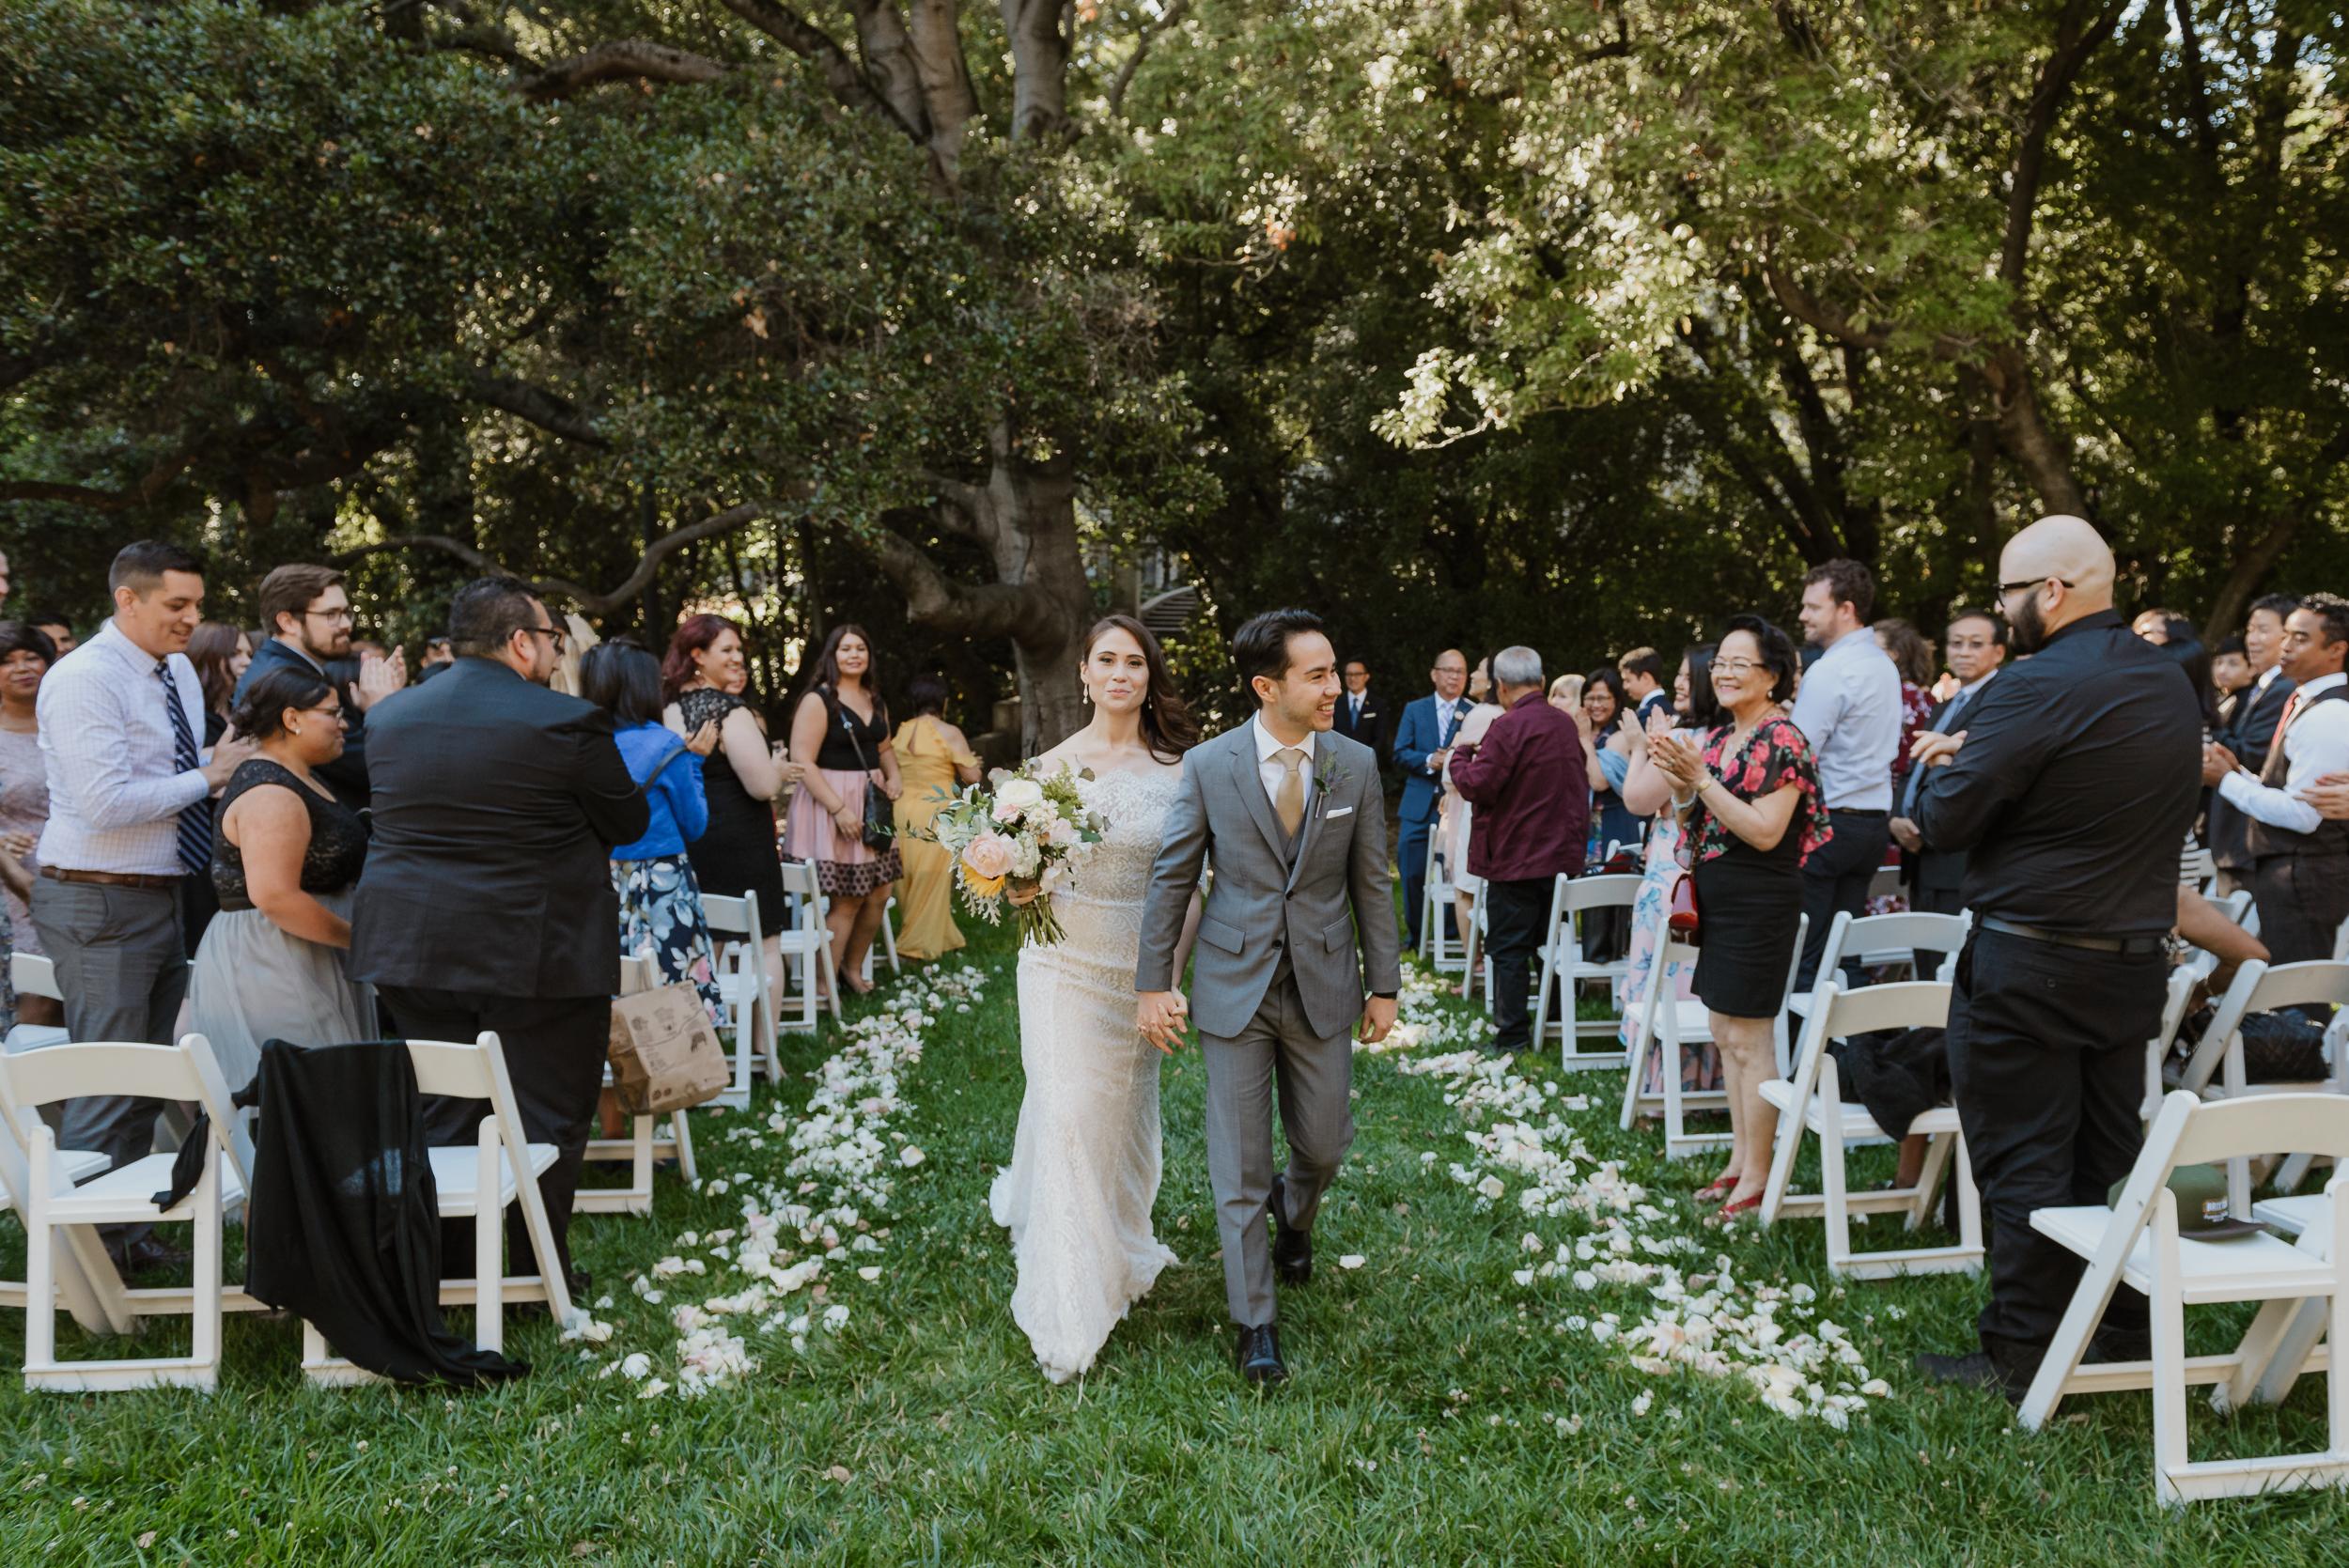 37-berkeley-uc-faculty-club-wedding-kb-vivianchen-272.jpg